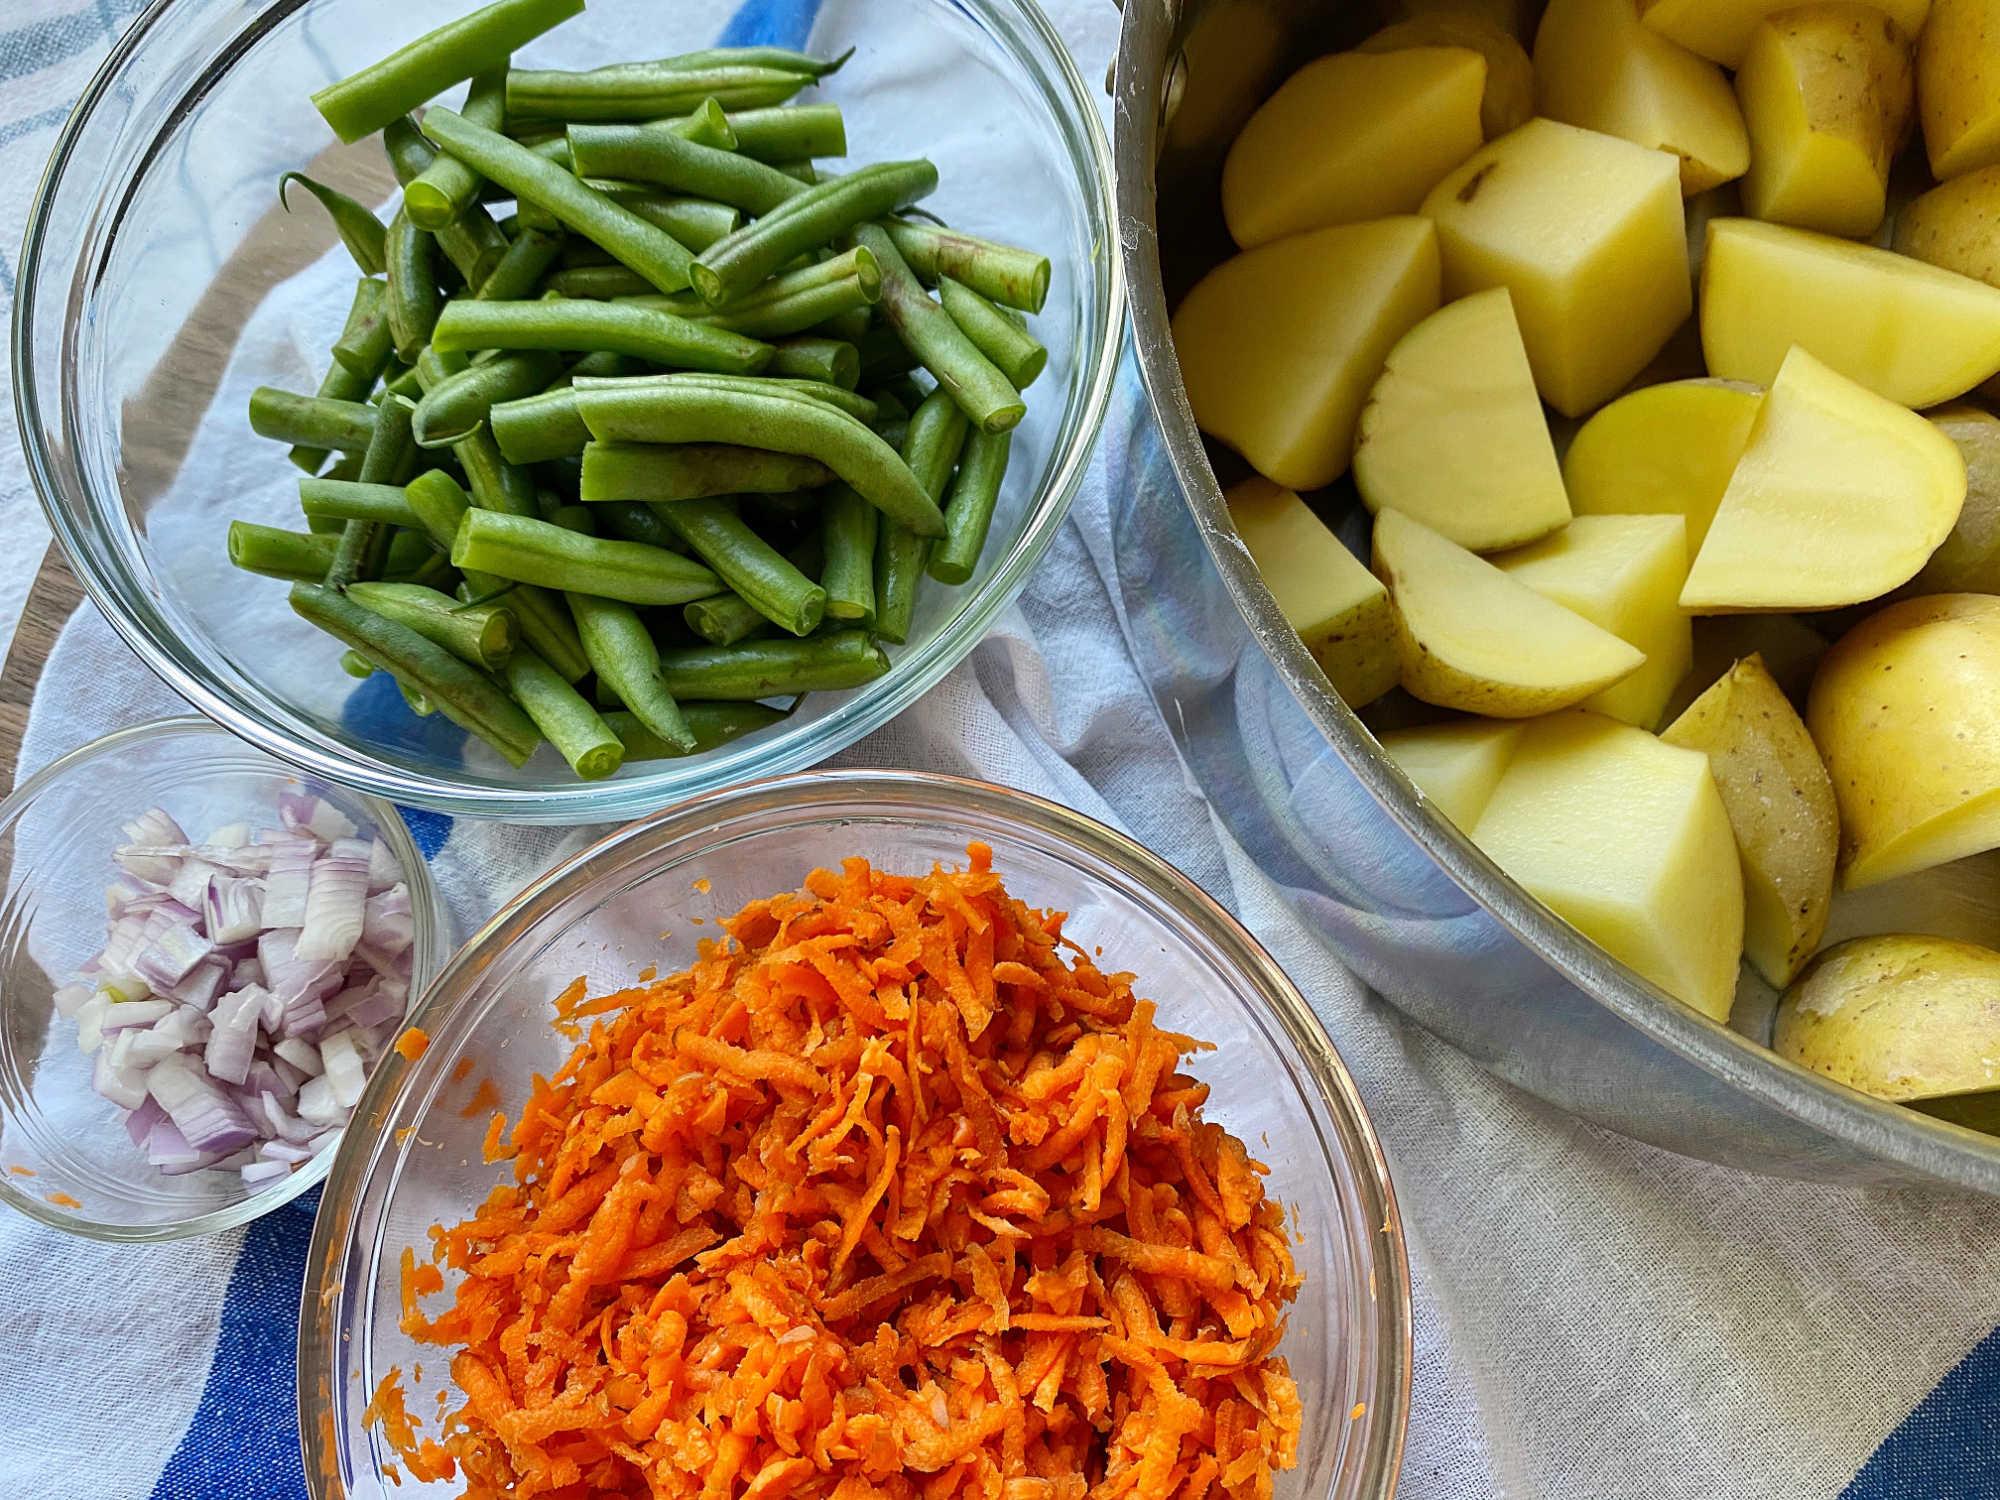 potato salad prepped veggies